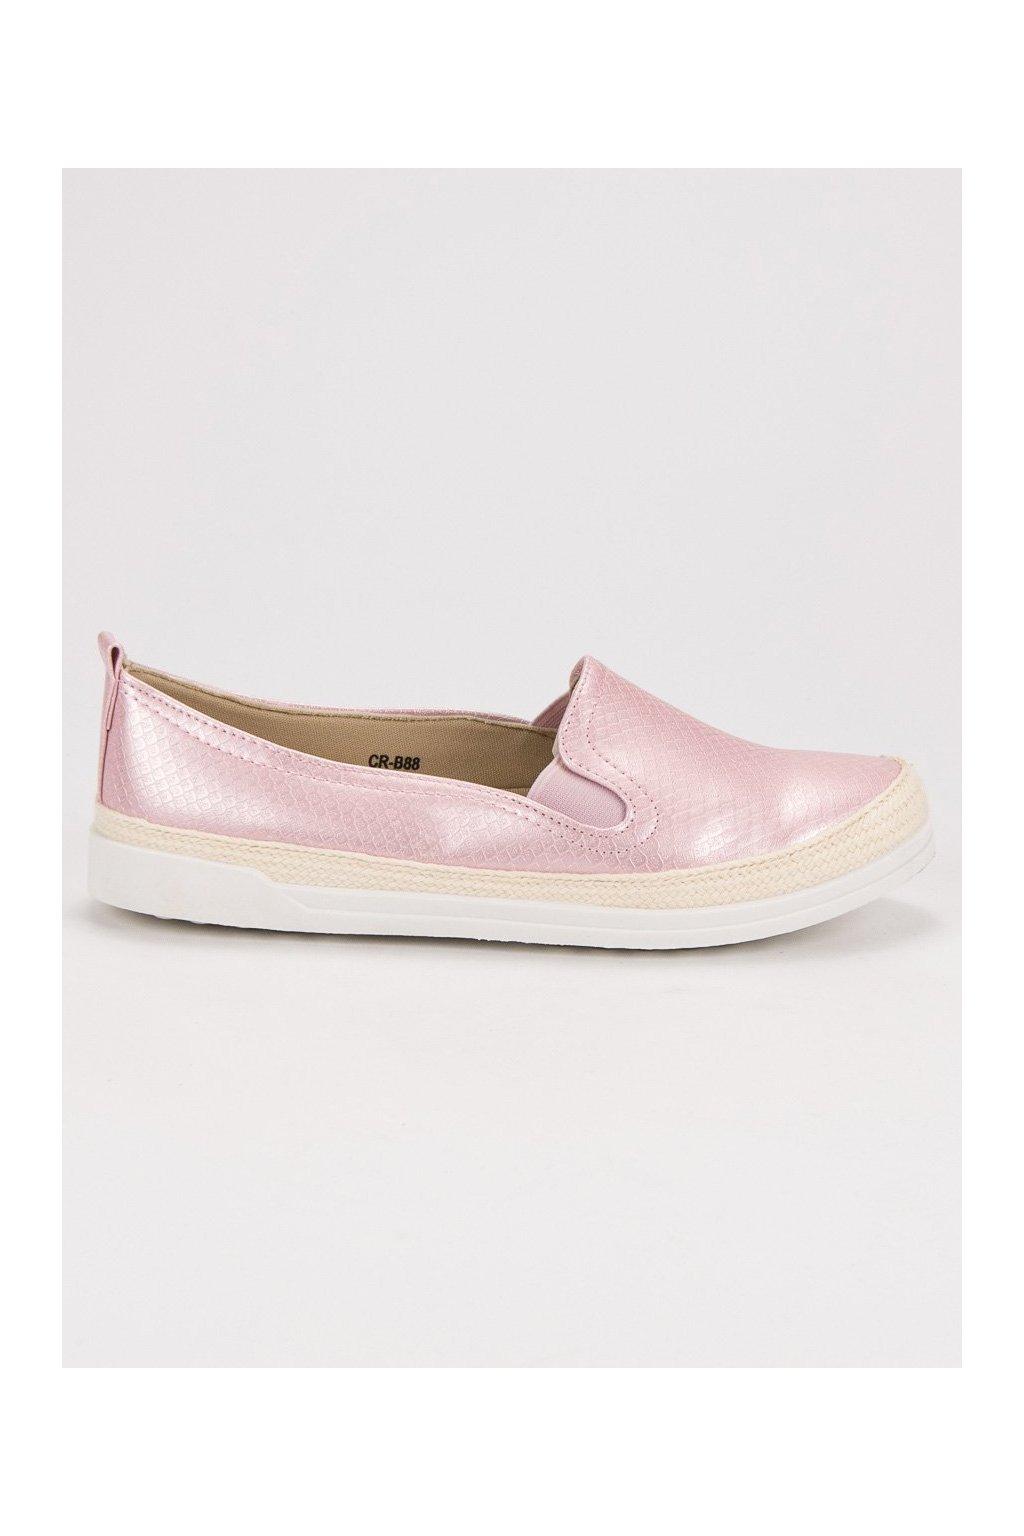 Ružové tenisky slip on CnB